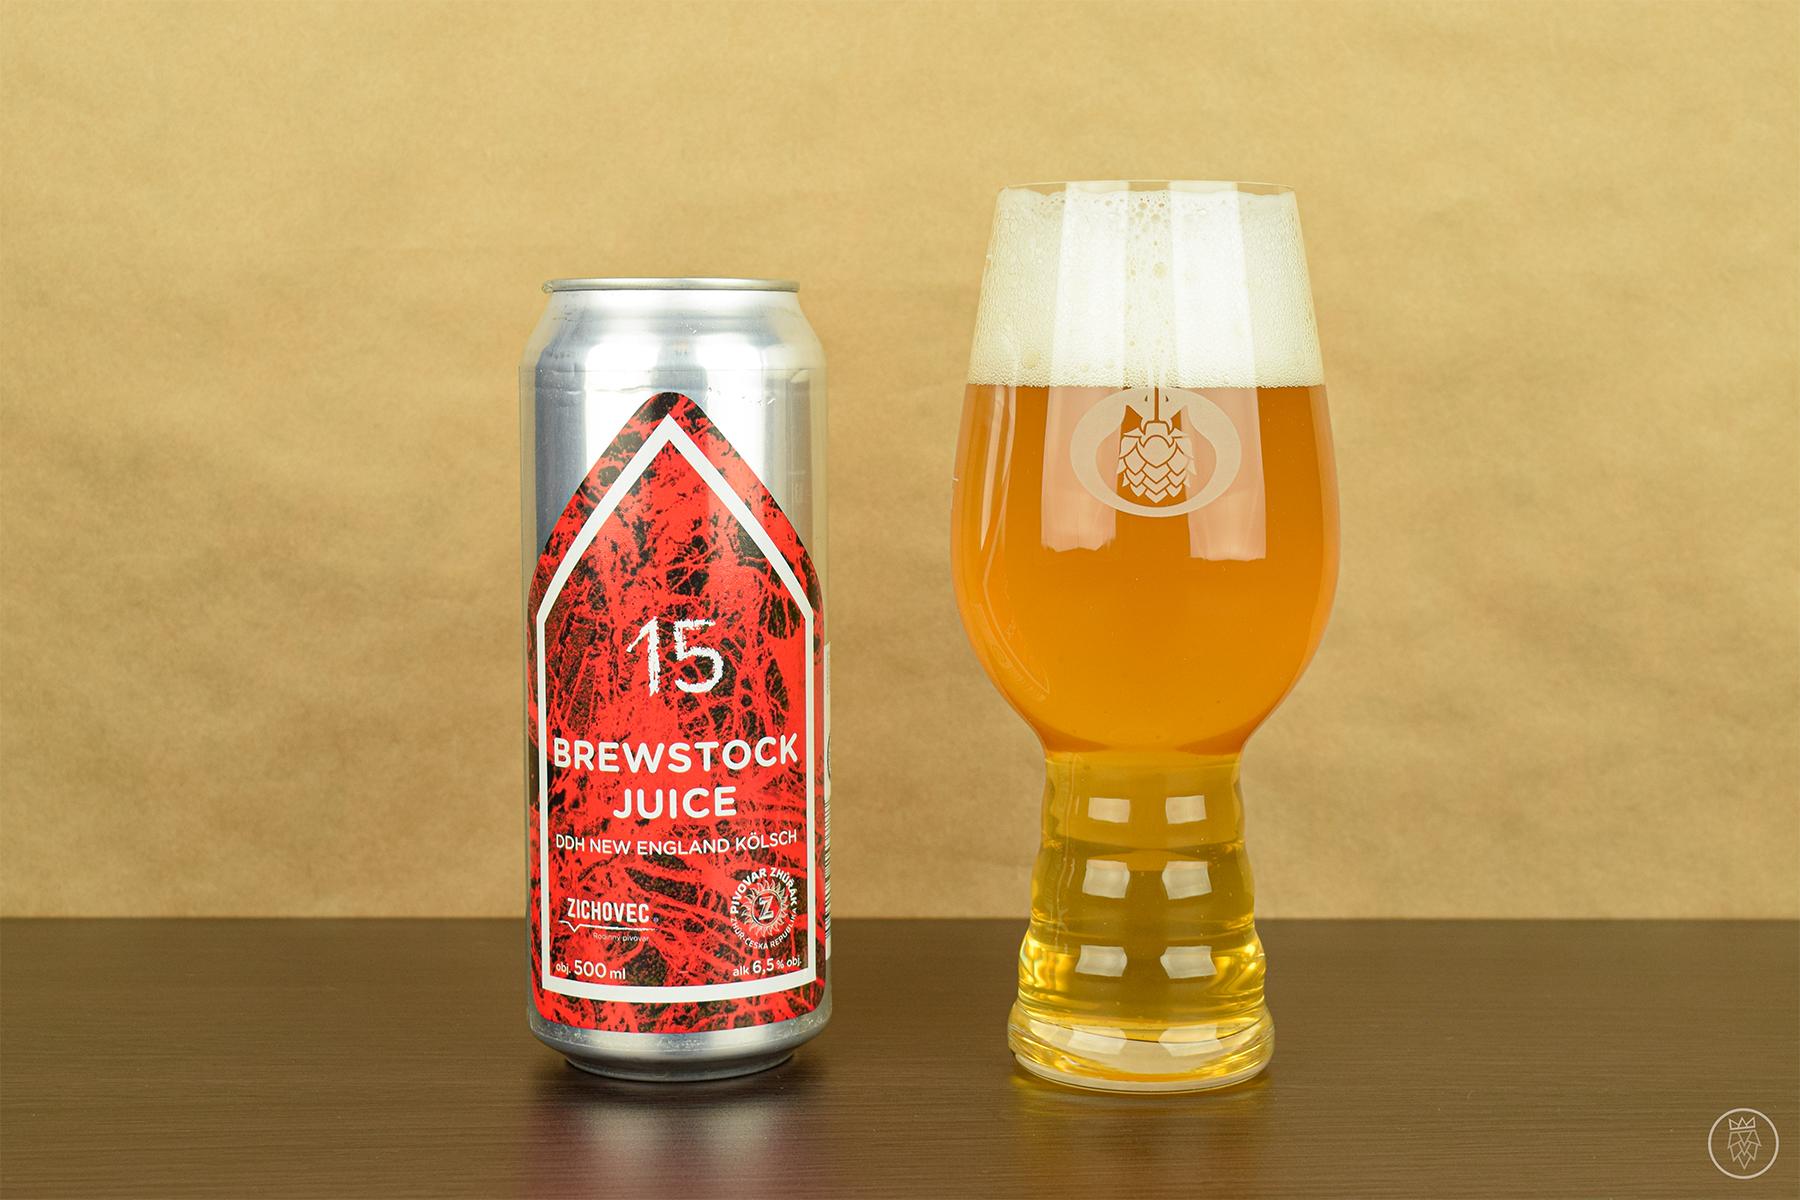 Brewstock Juice